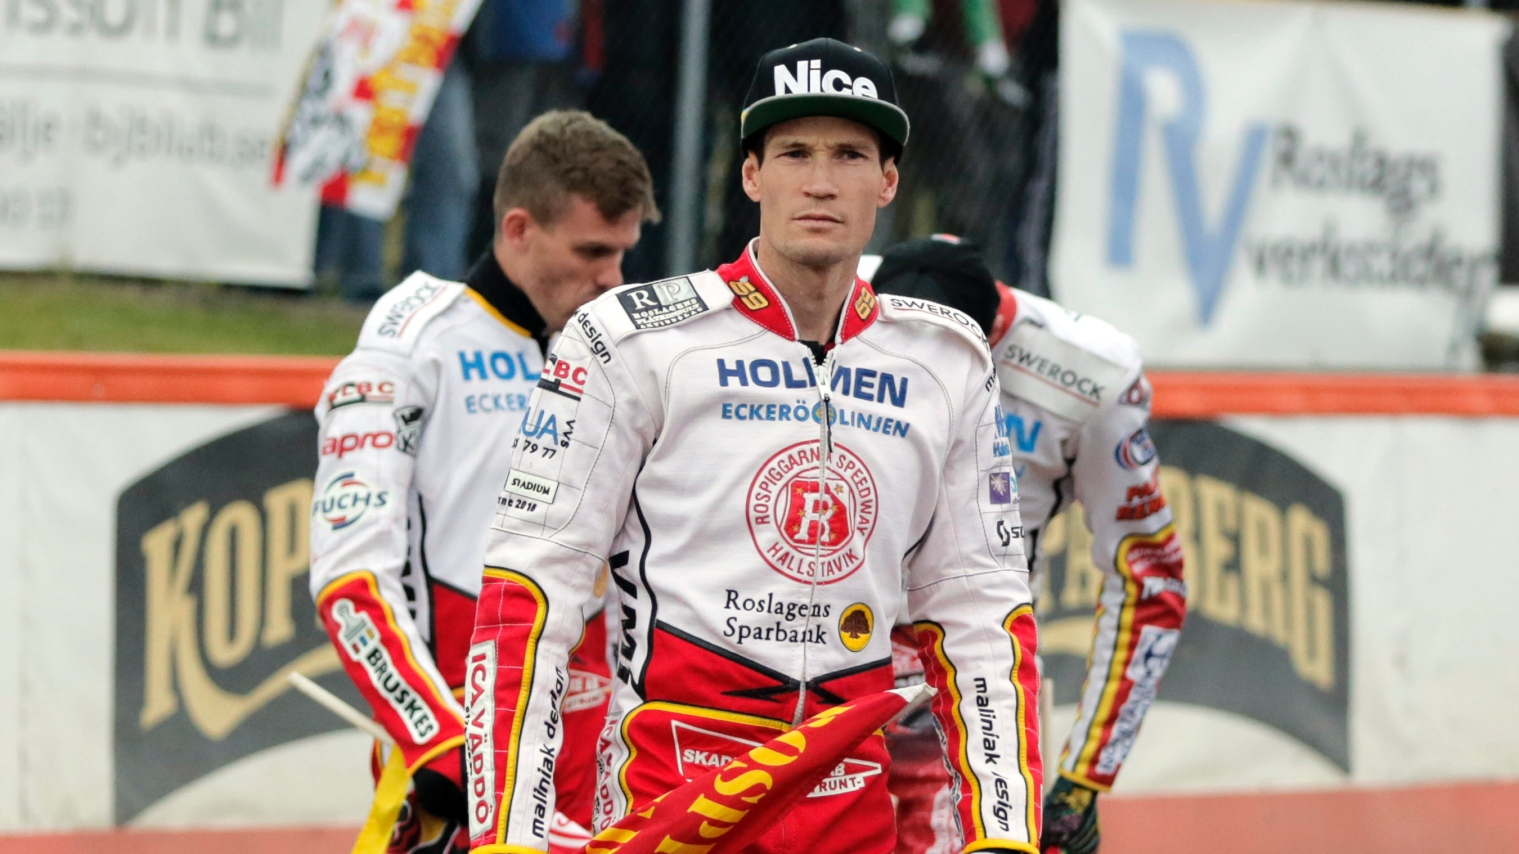 Jonsson leder varldscupen efter ny seger